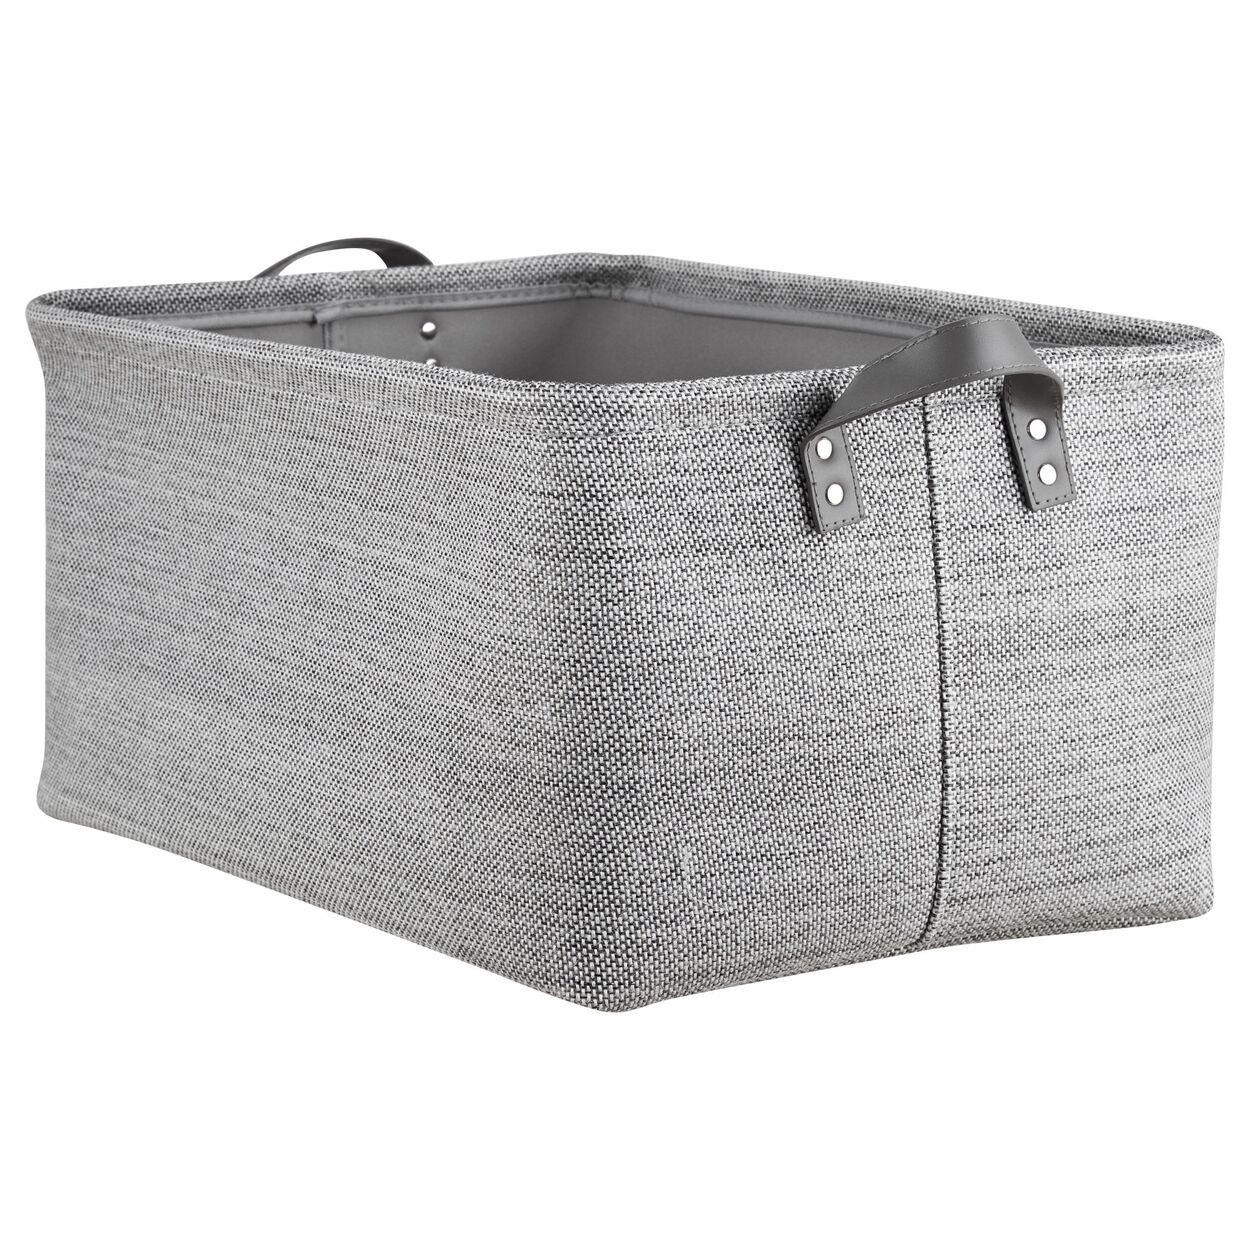 X-Large Storage Basket with Handles